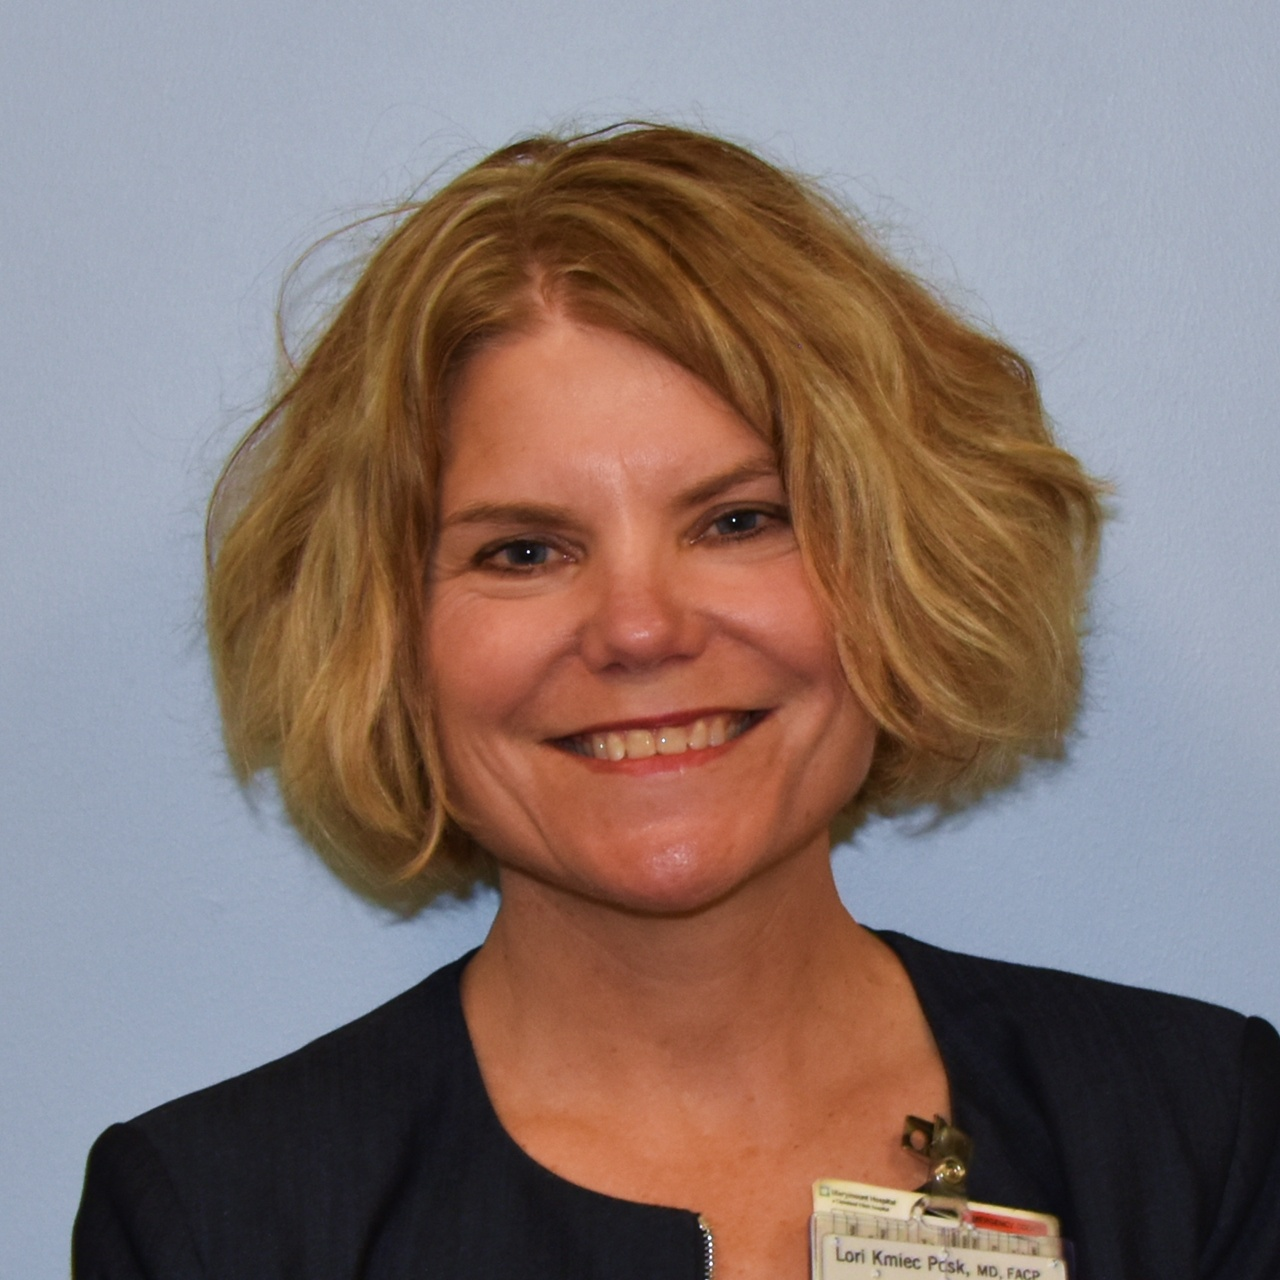 Lori Posk